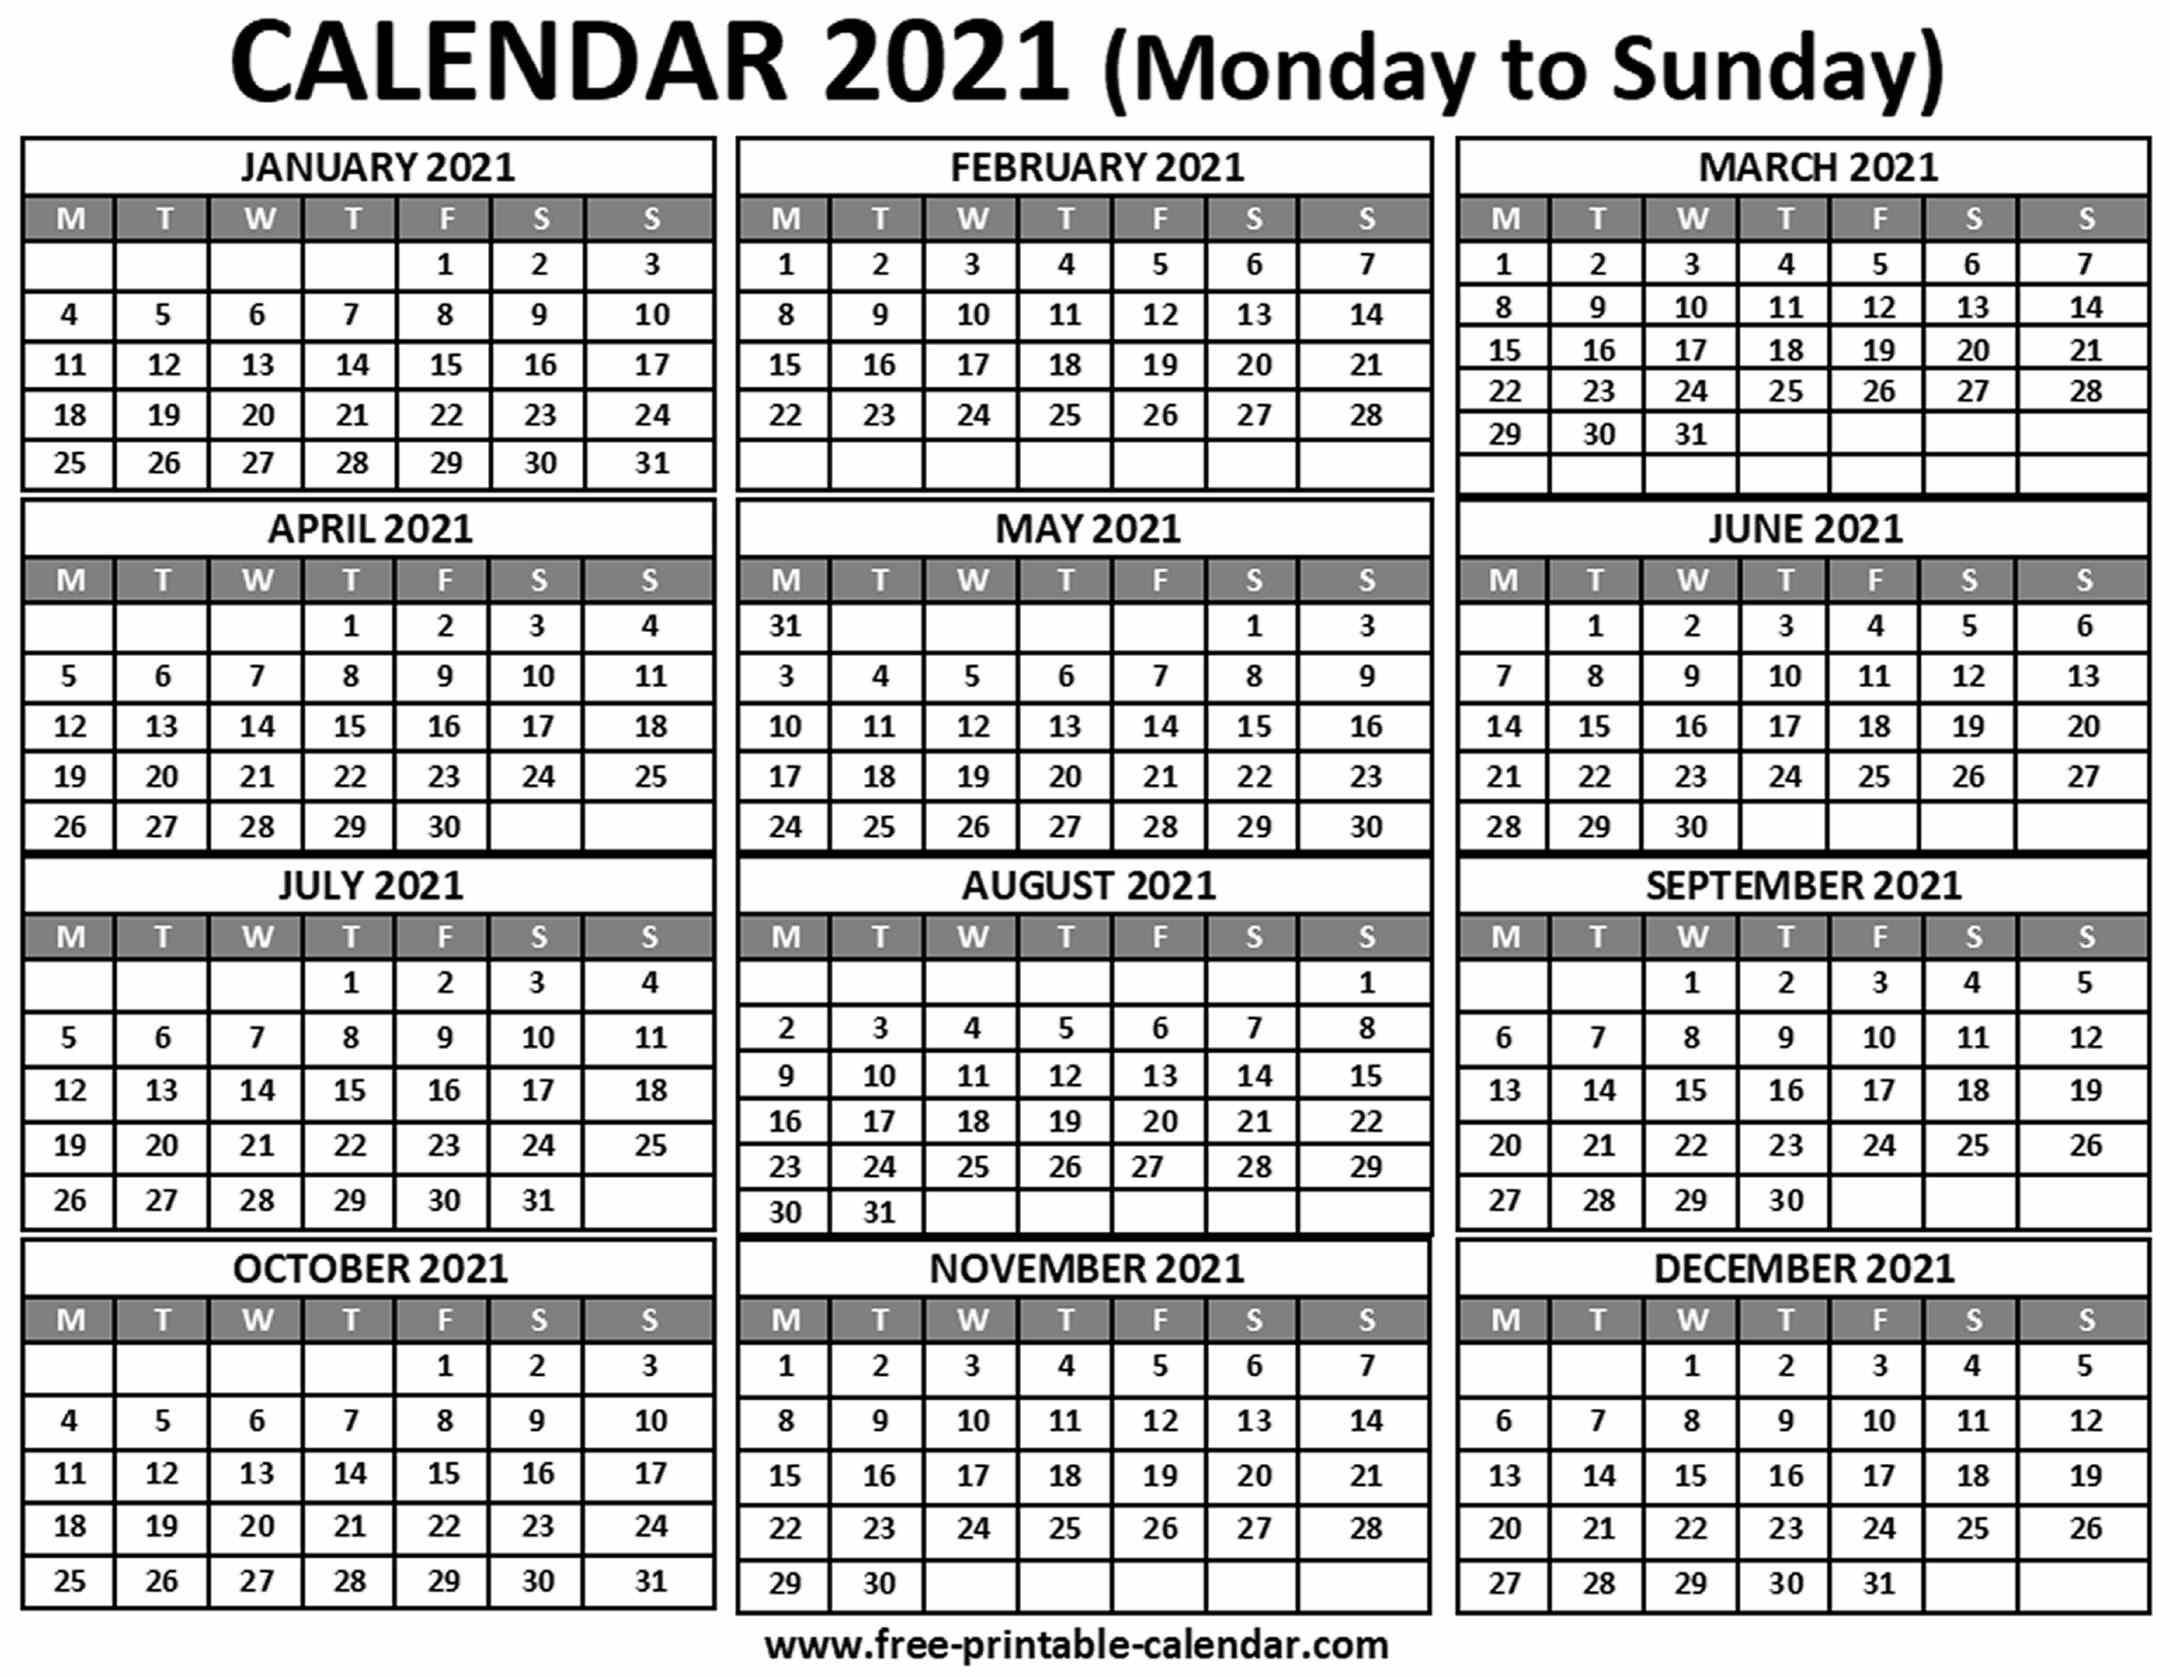 2021 Calendar - Free-Printable-Calendar